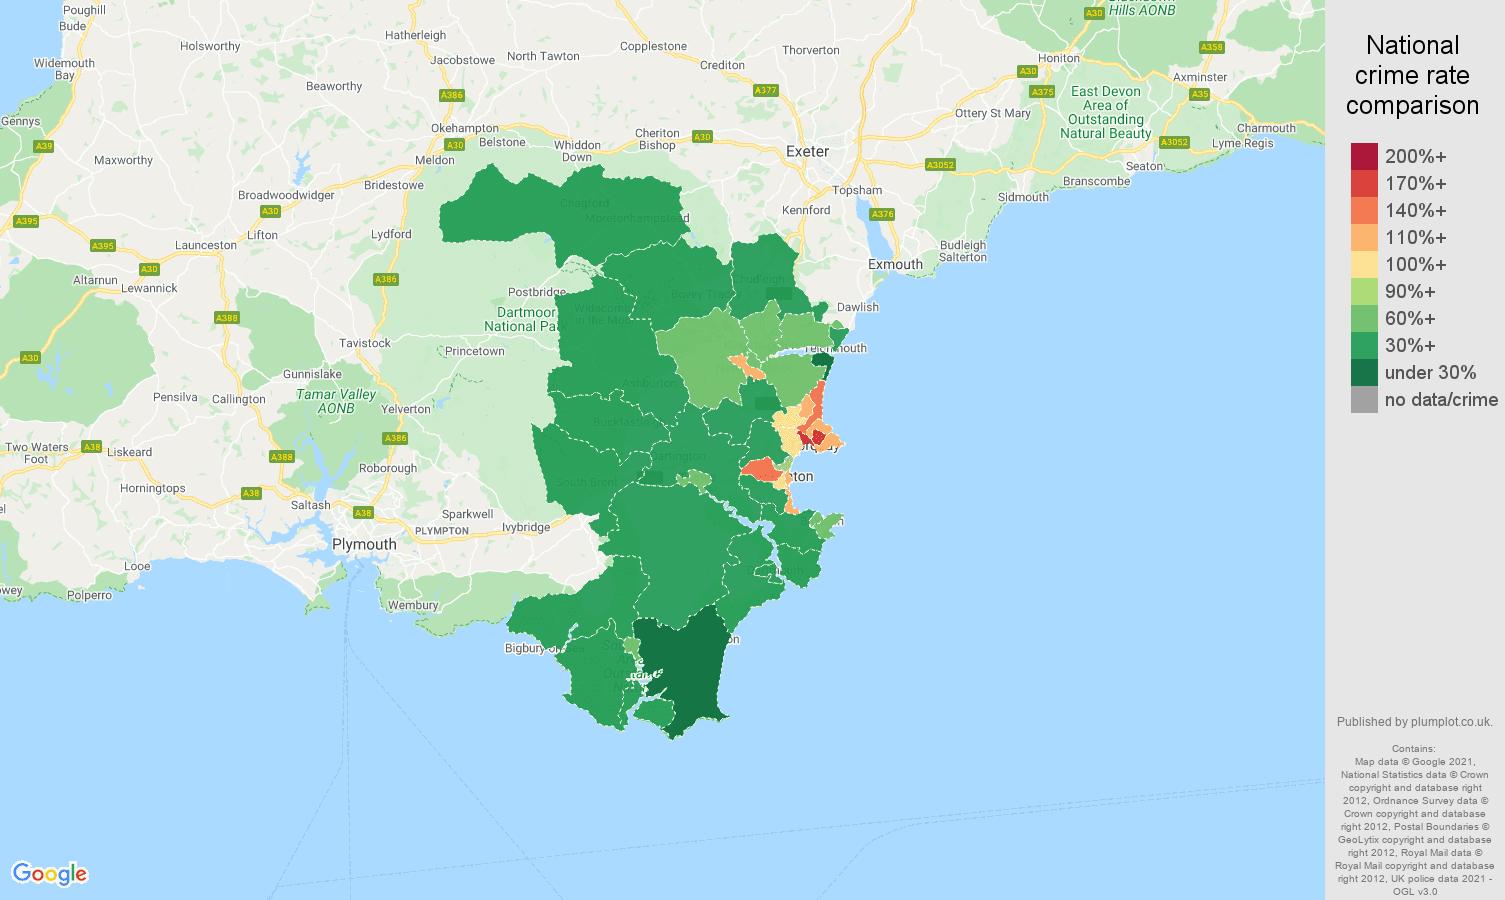 Torquay violent crime rate comparison map